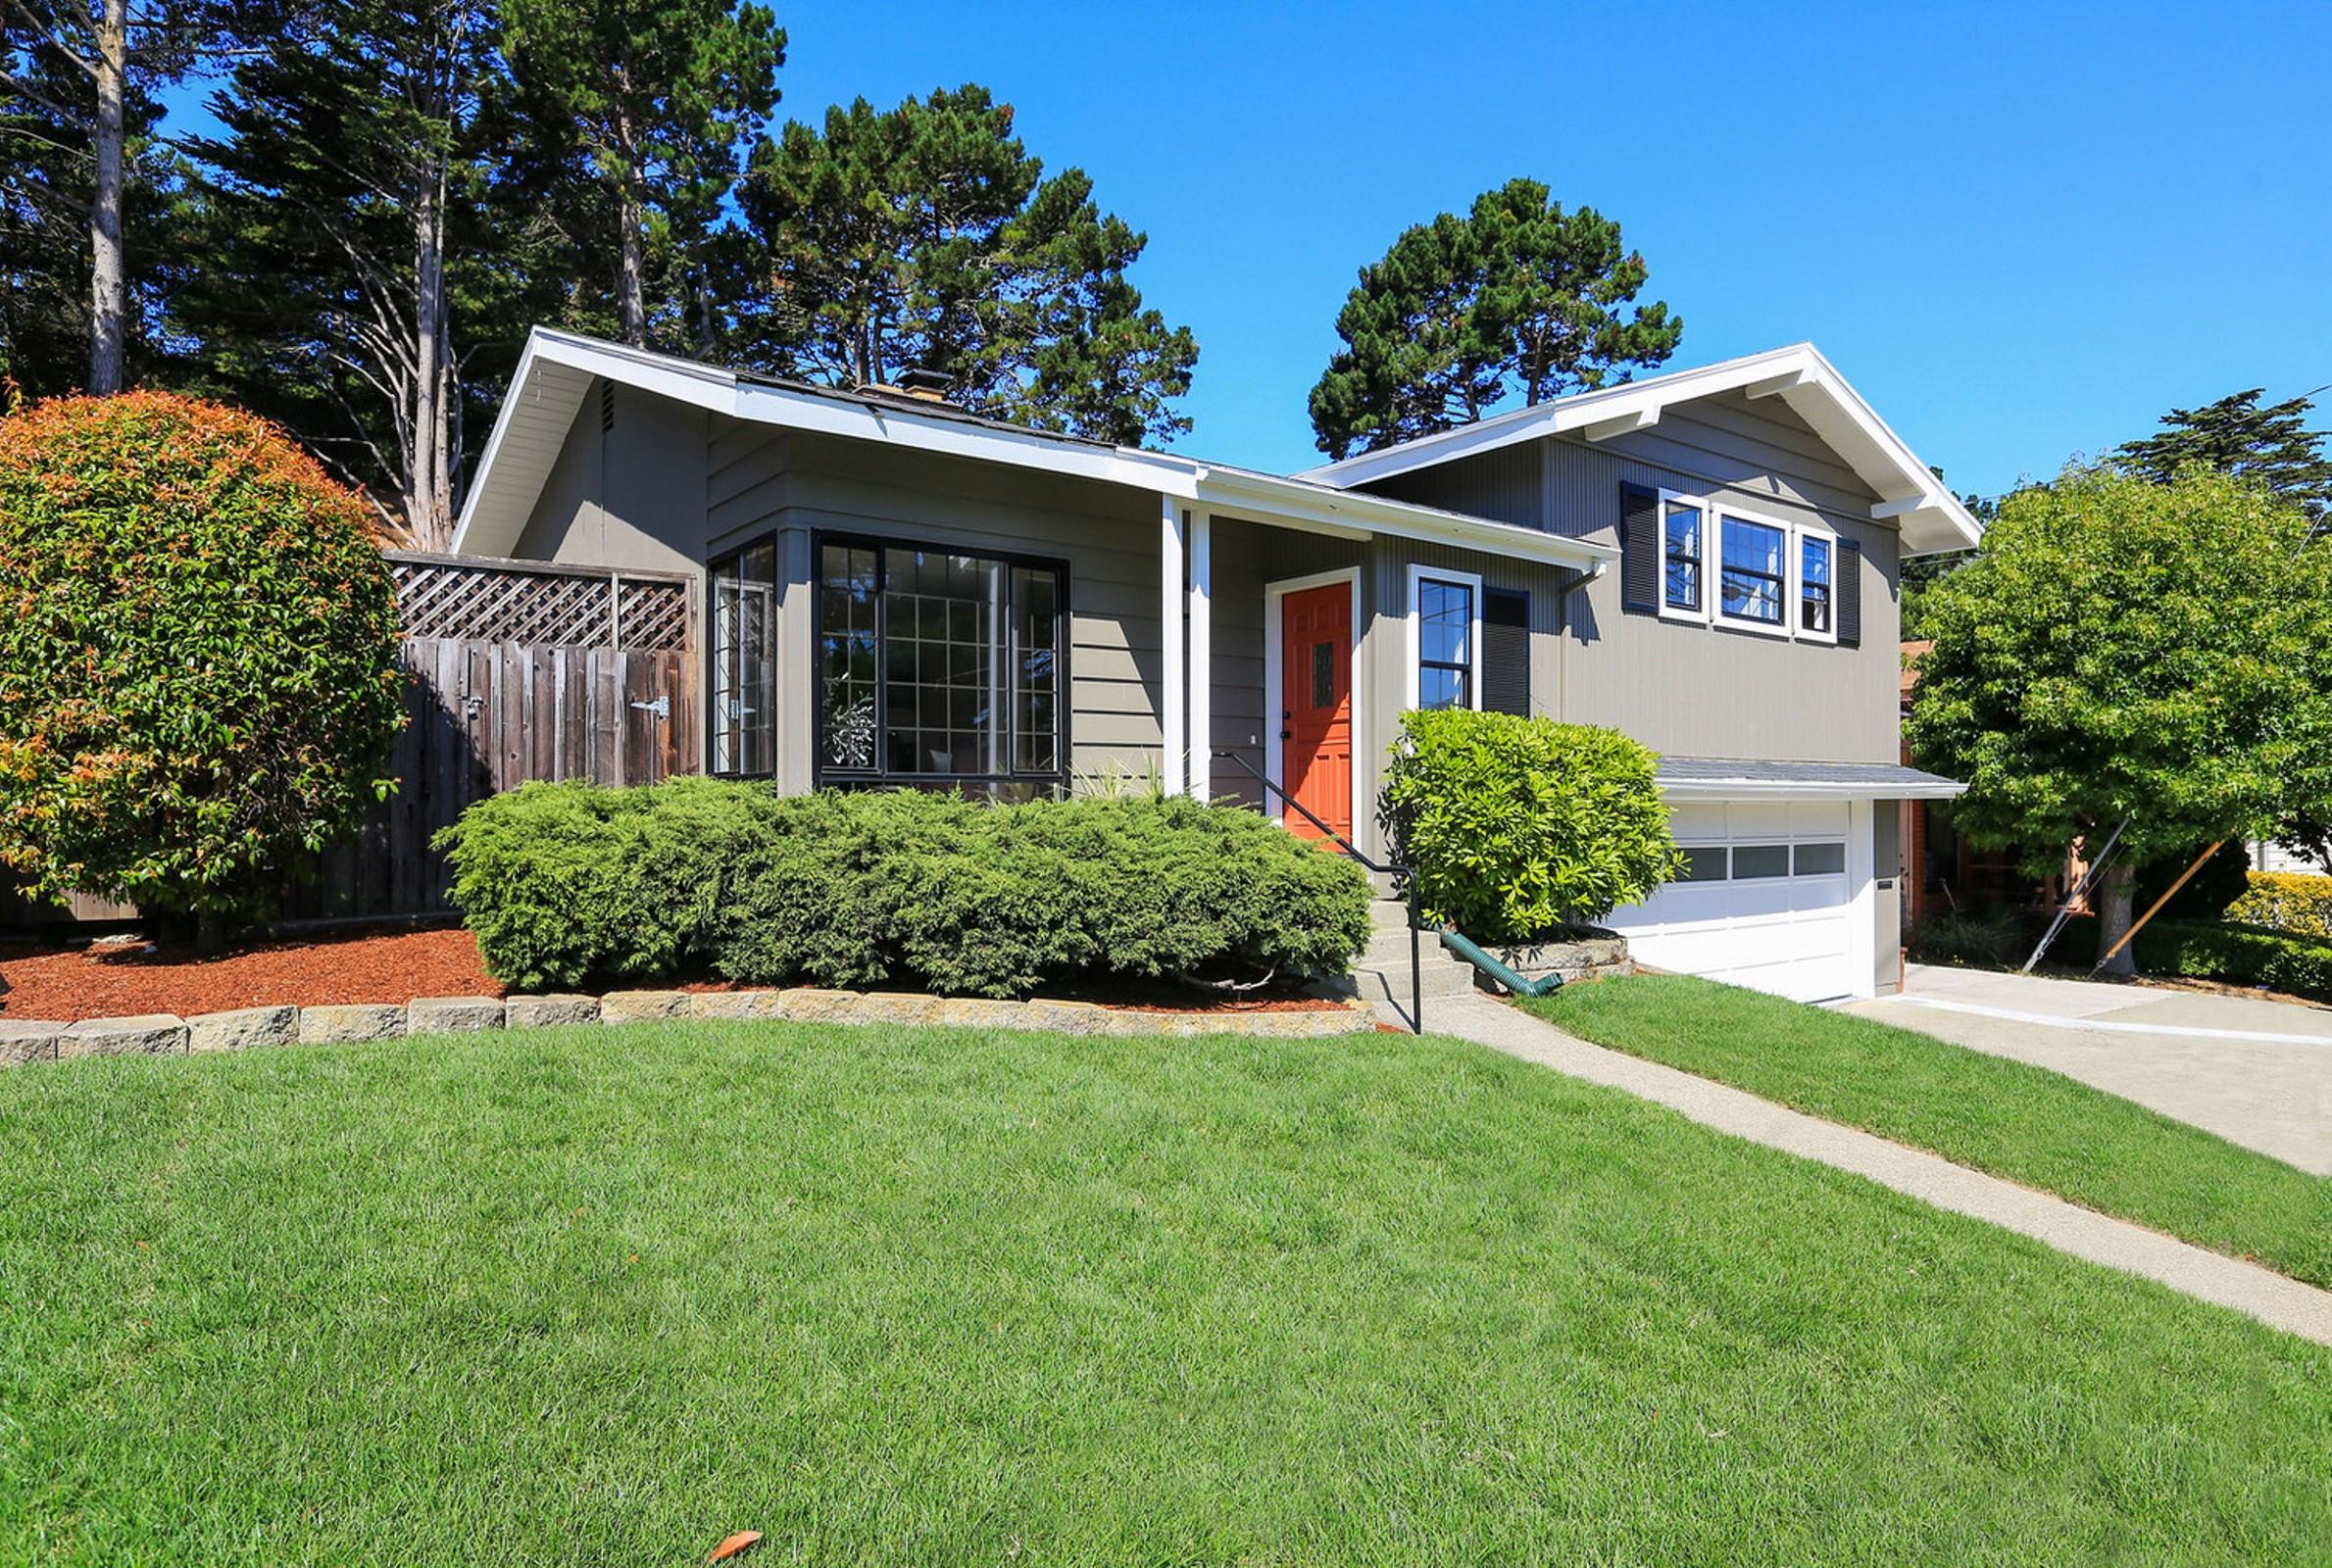 Single Family Home for Sale at 332 Alta Mesa Dr., South San Francisco South San Francisco, California 94080 United States